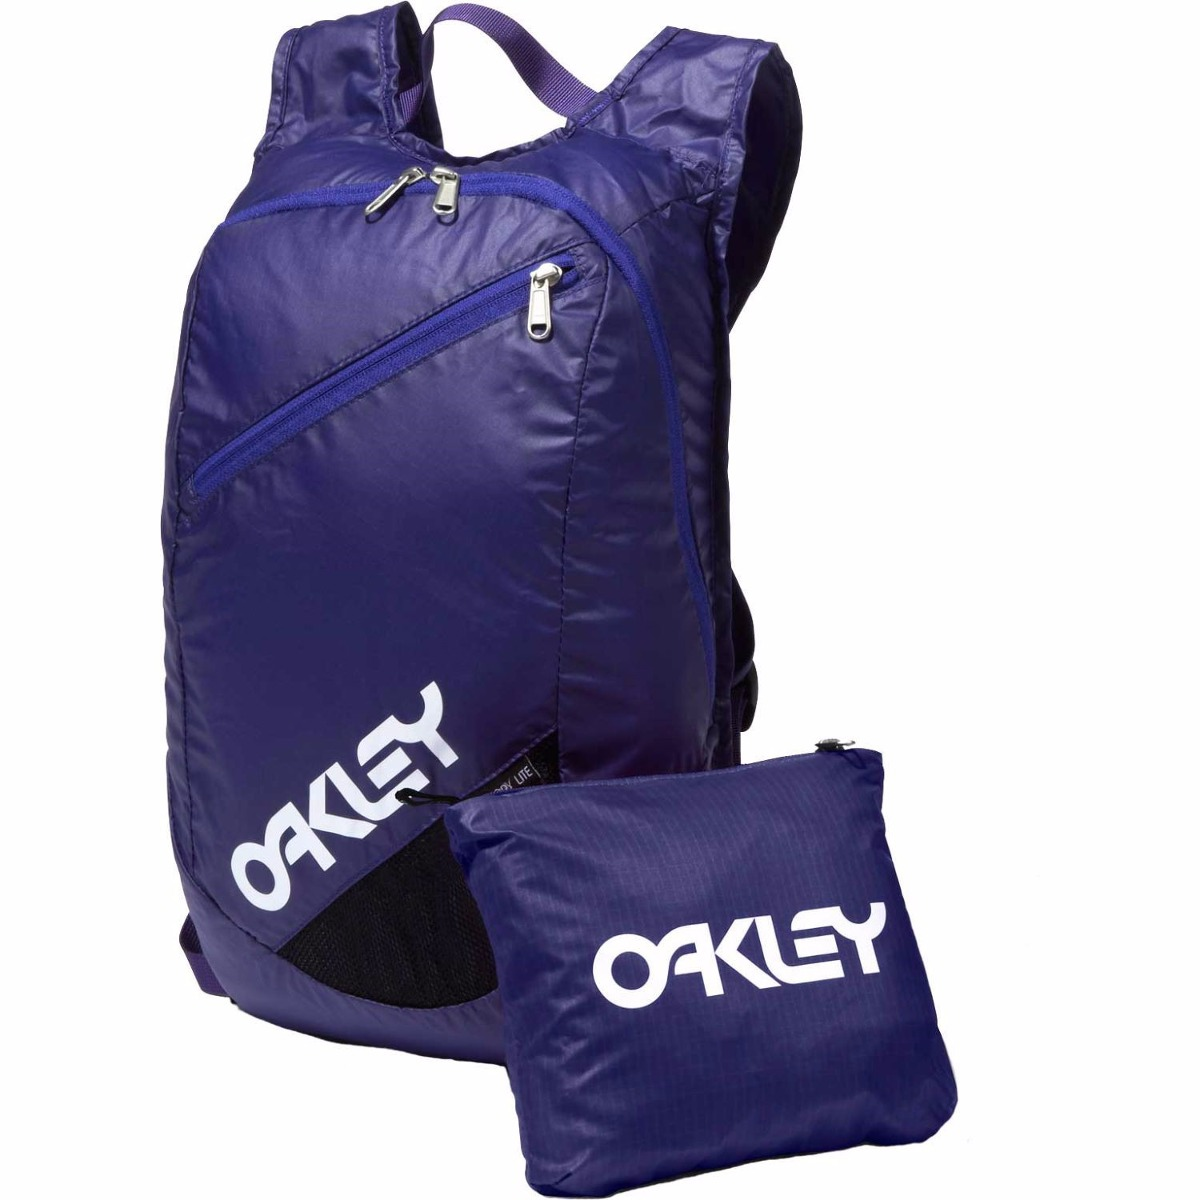 oakley kitchen sink backpack review inexpensive islands mochilas mercadolivre   www.tapdance.org